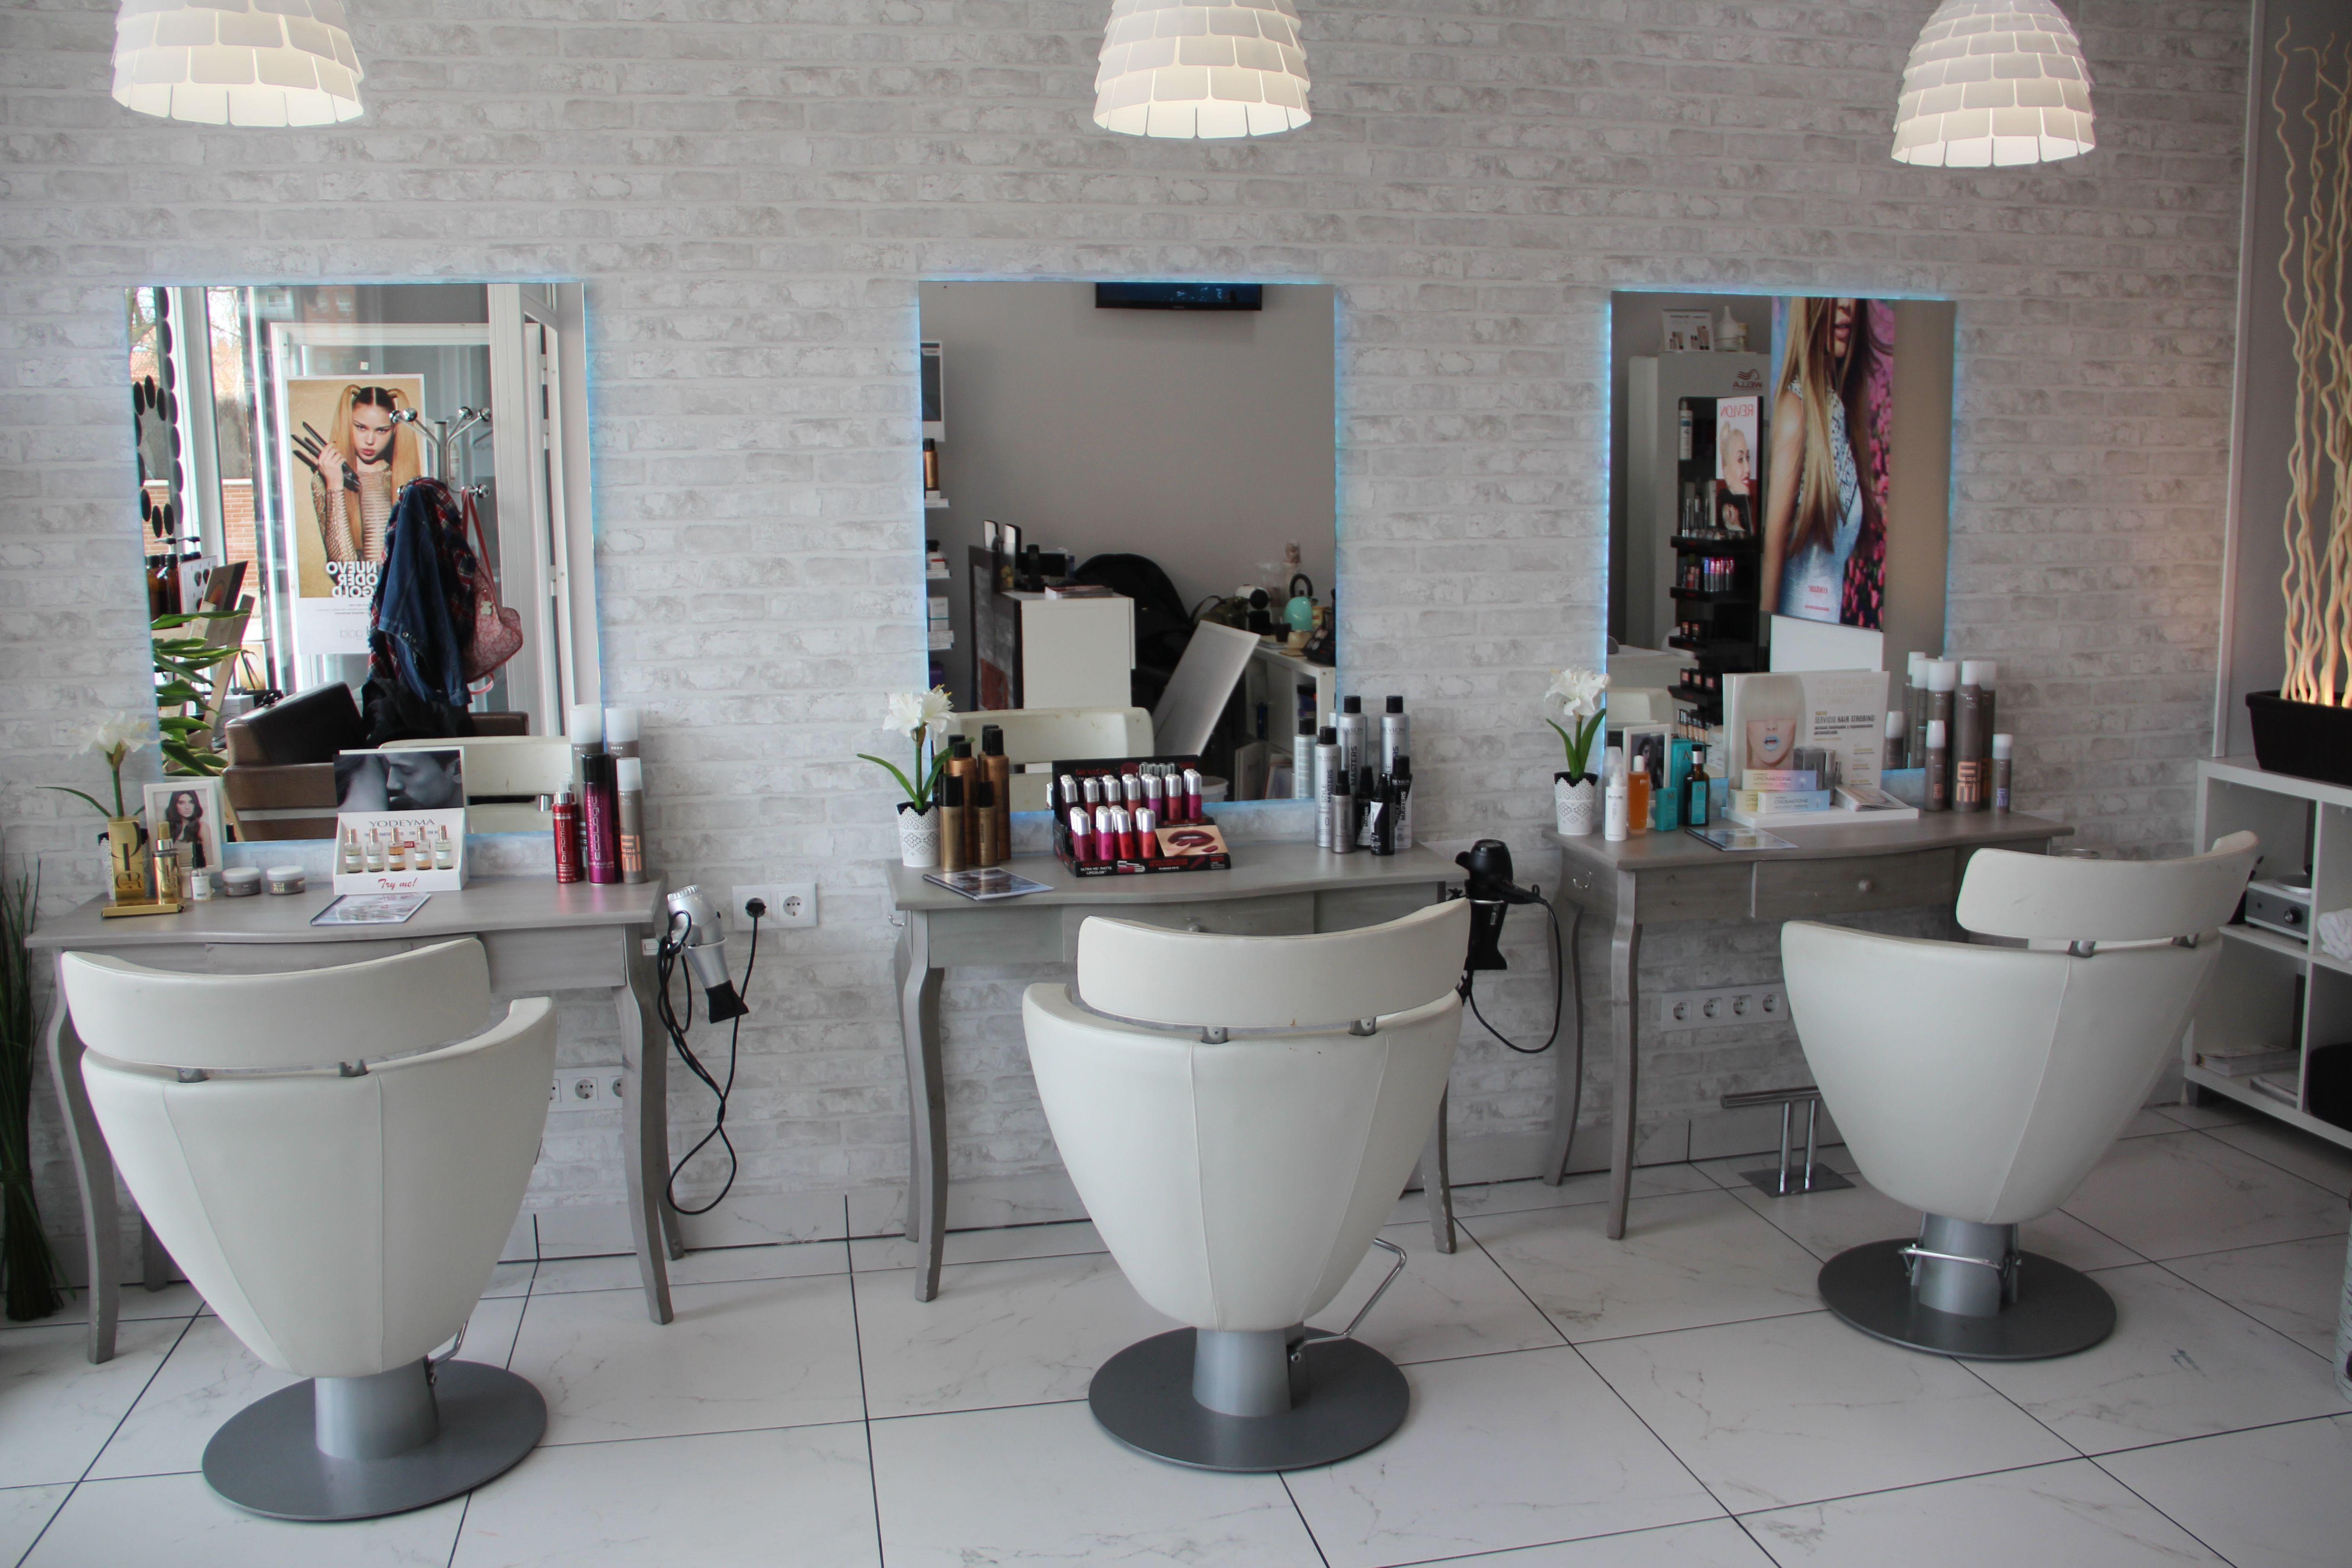 Gum Beauty & Art peluquería y estética en Móstoles